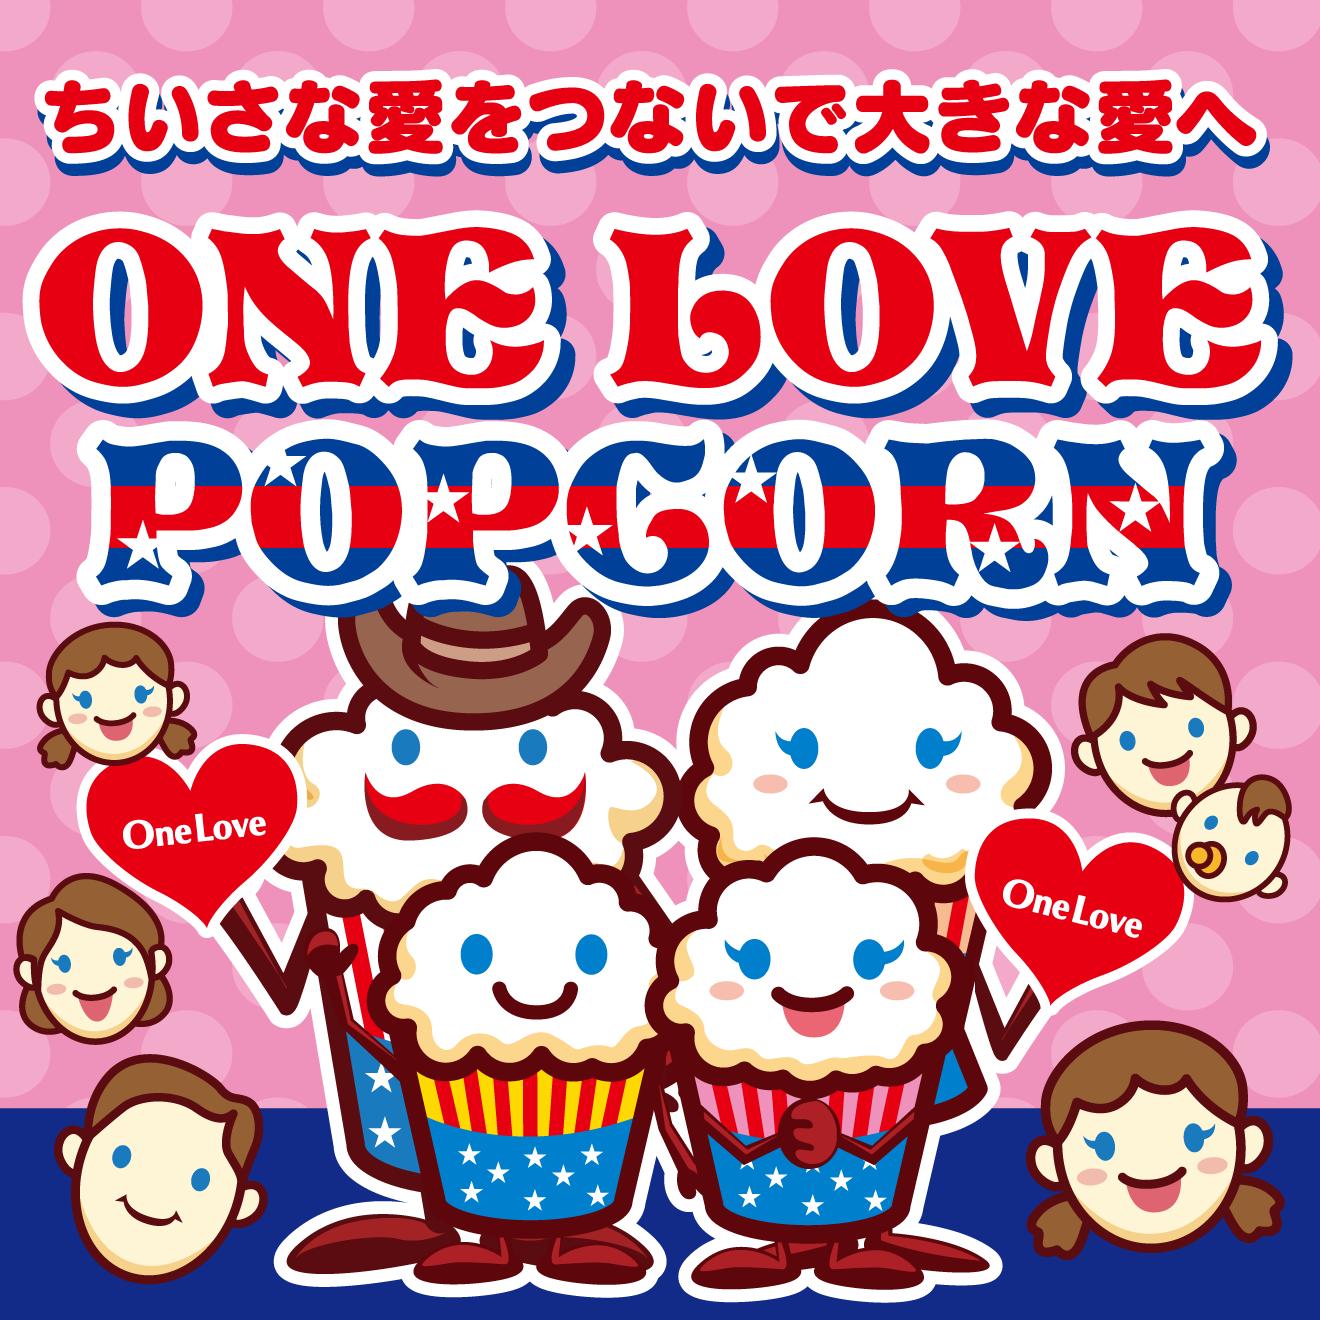 One Loveポップコーン